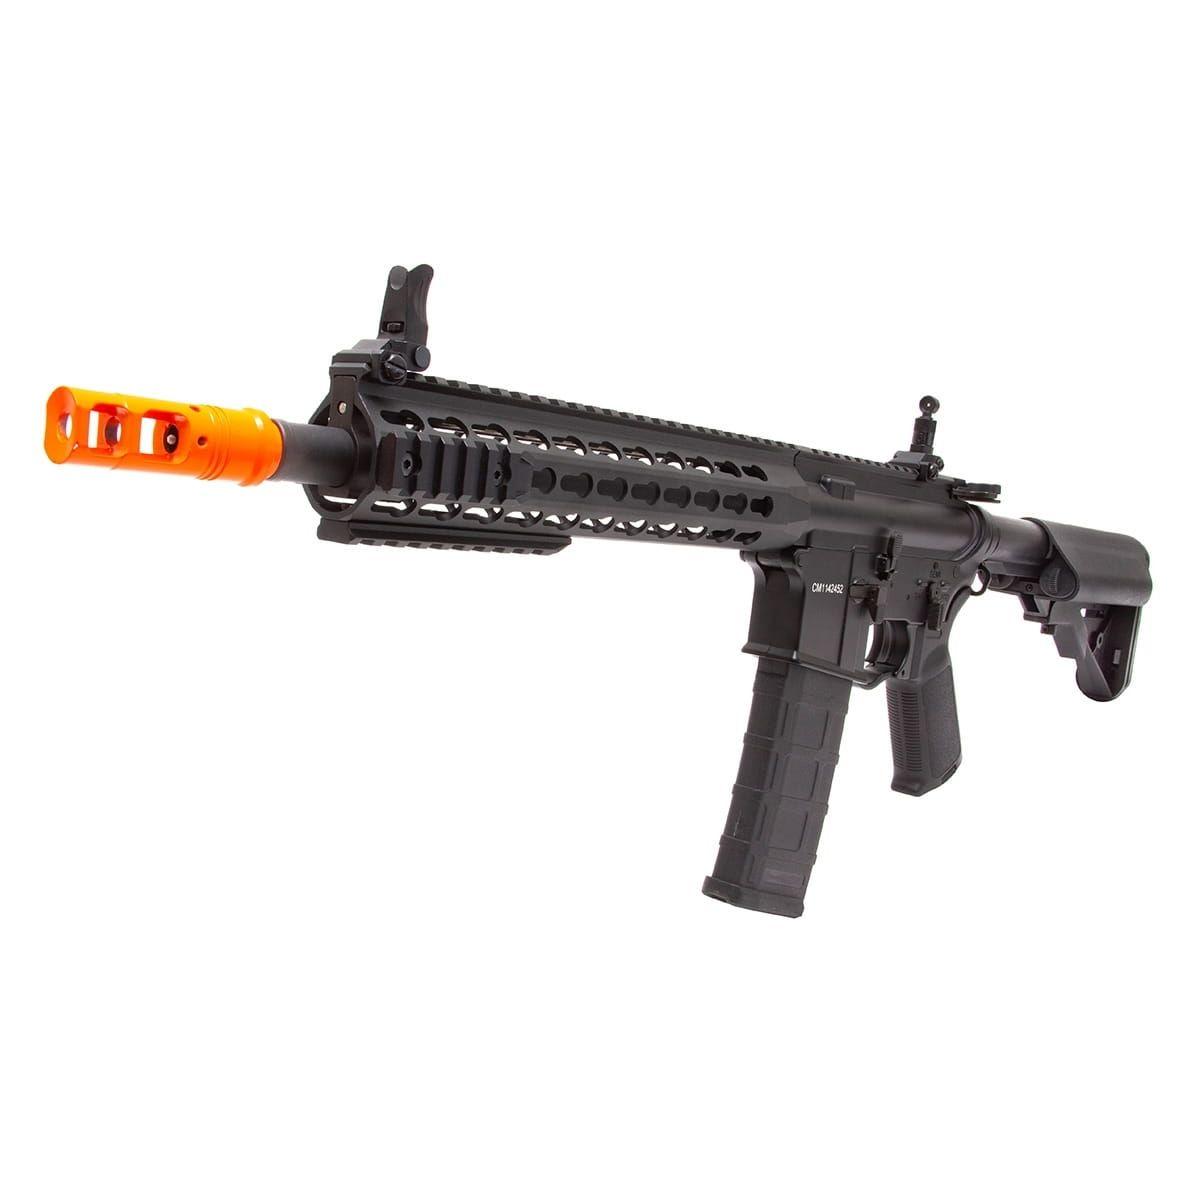 RIFLE AIRSOFT AEG M4A1 CM068 CYMA FUL METAL